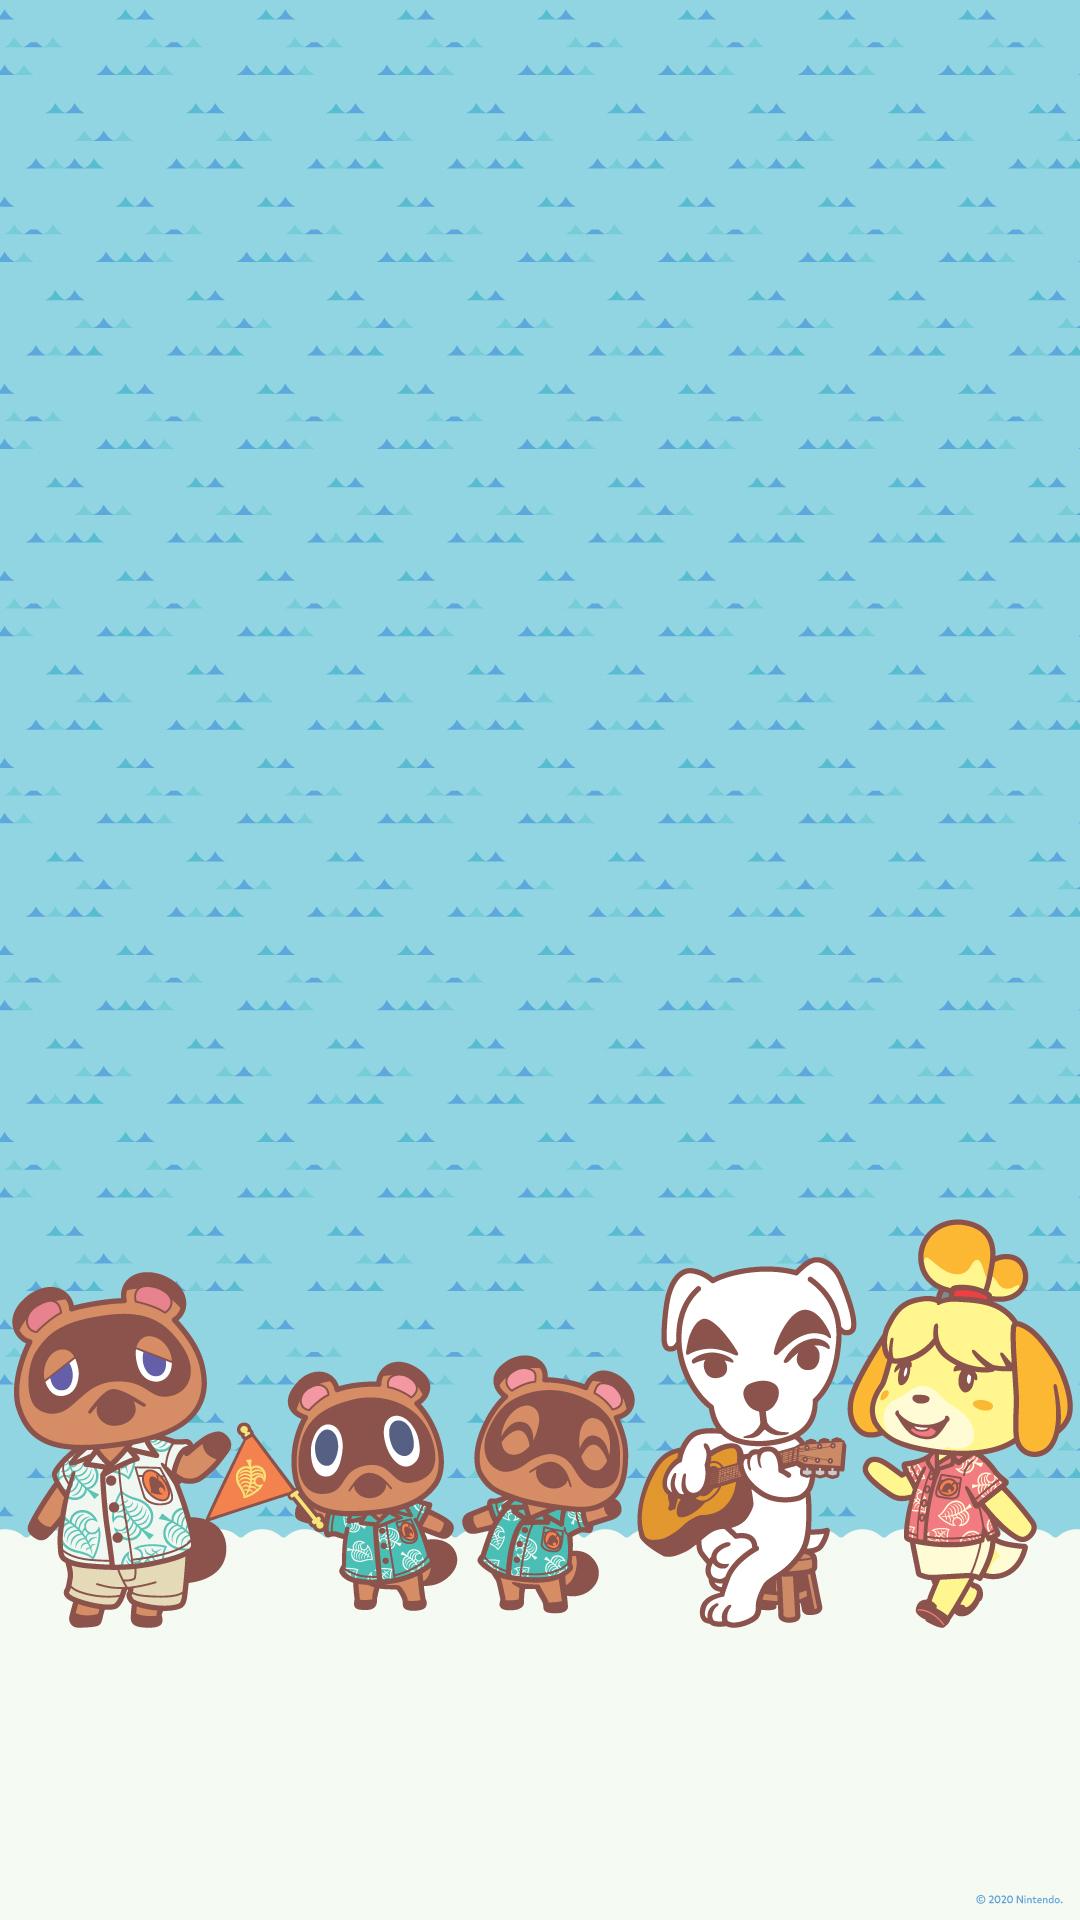 Animal Crossing iPhone wallpaper Walmart iDownloadBlog 3